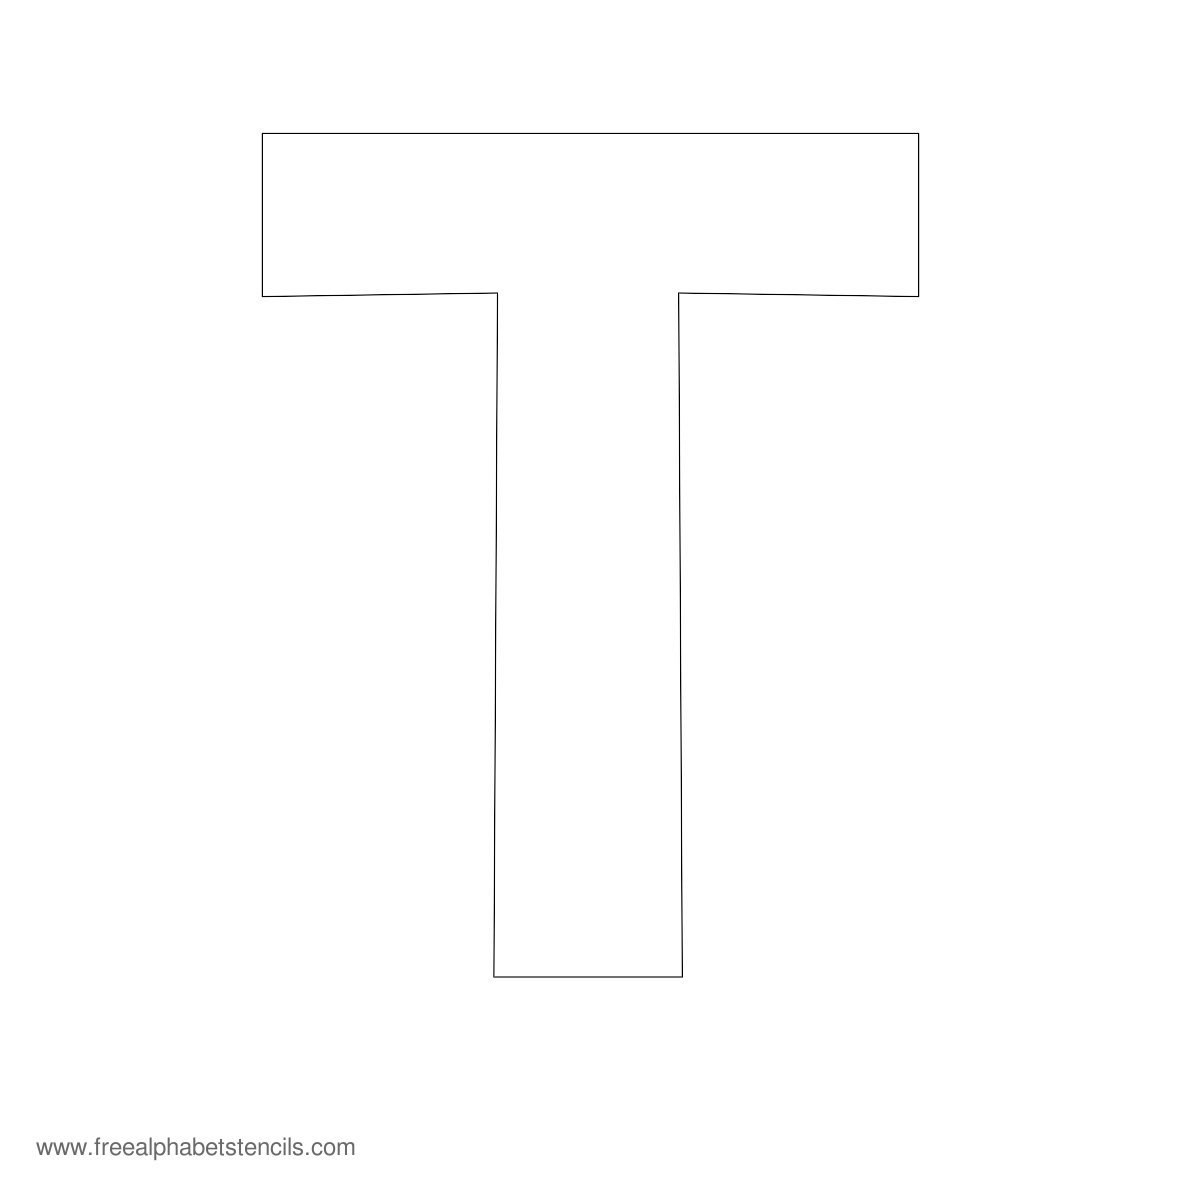 Large Alphabet Stencils  Freealphabetstencils Throughout Large Letter Templates